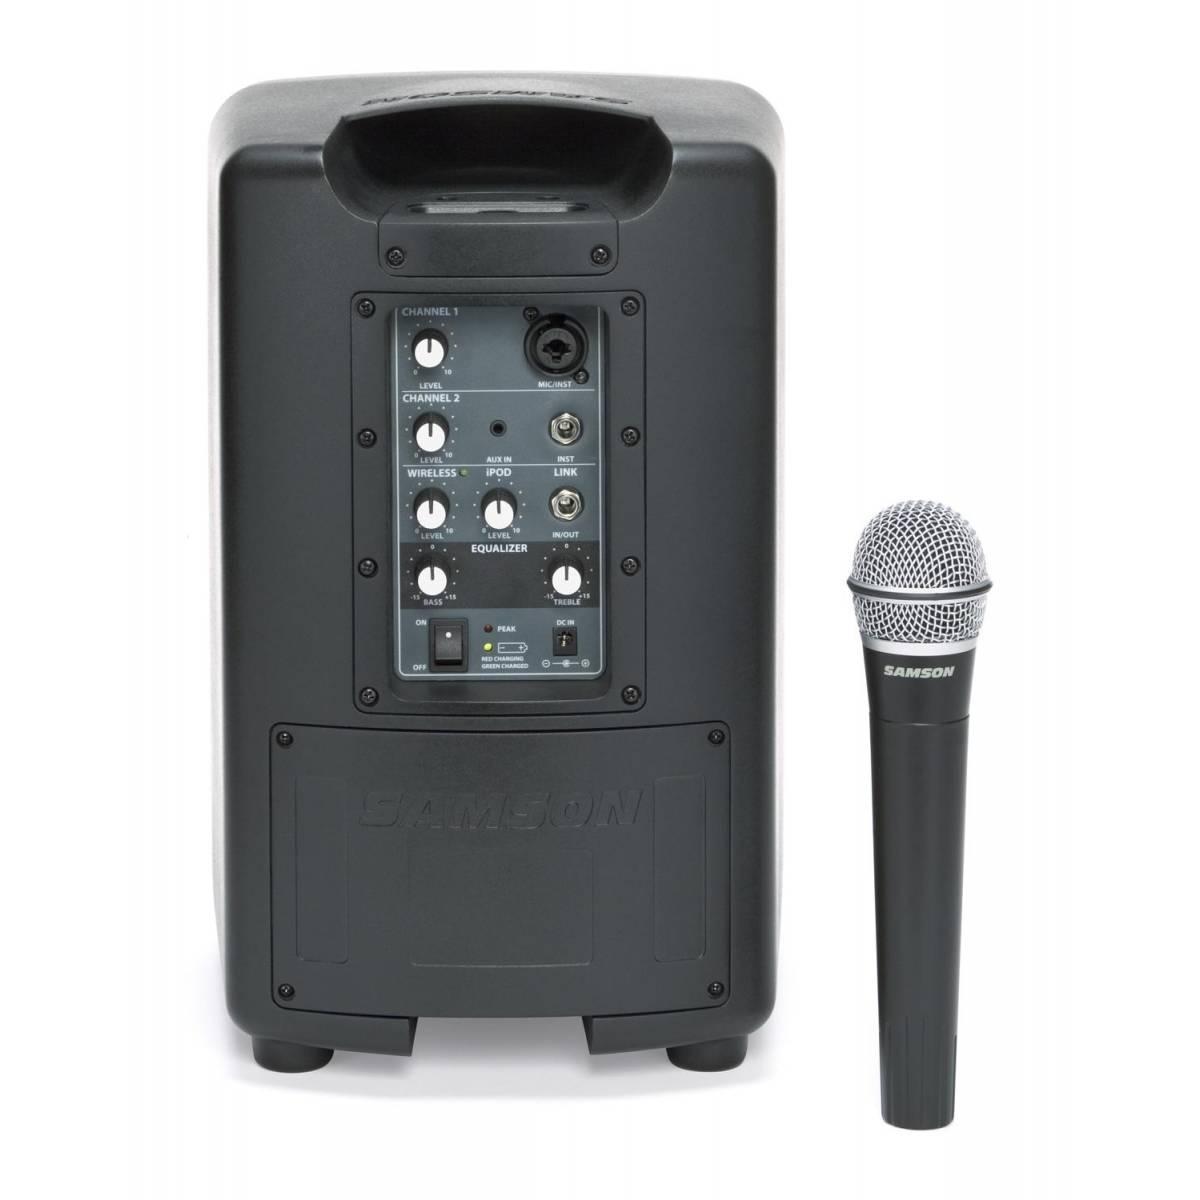 samson expedition 40iw portable pa system. Black Bedroom Furniture Sets. Home Design Ideas